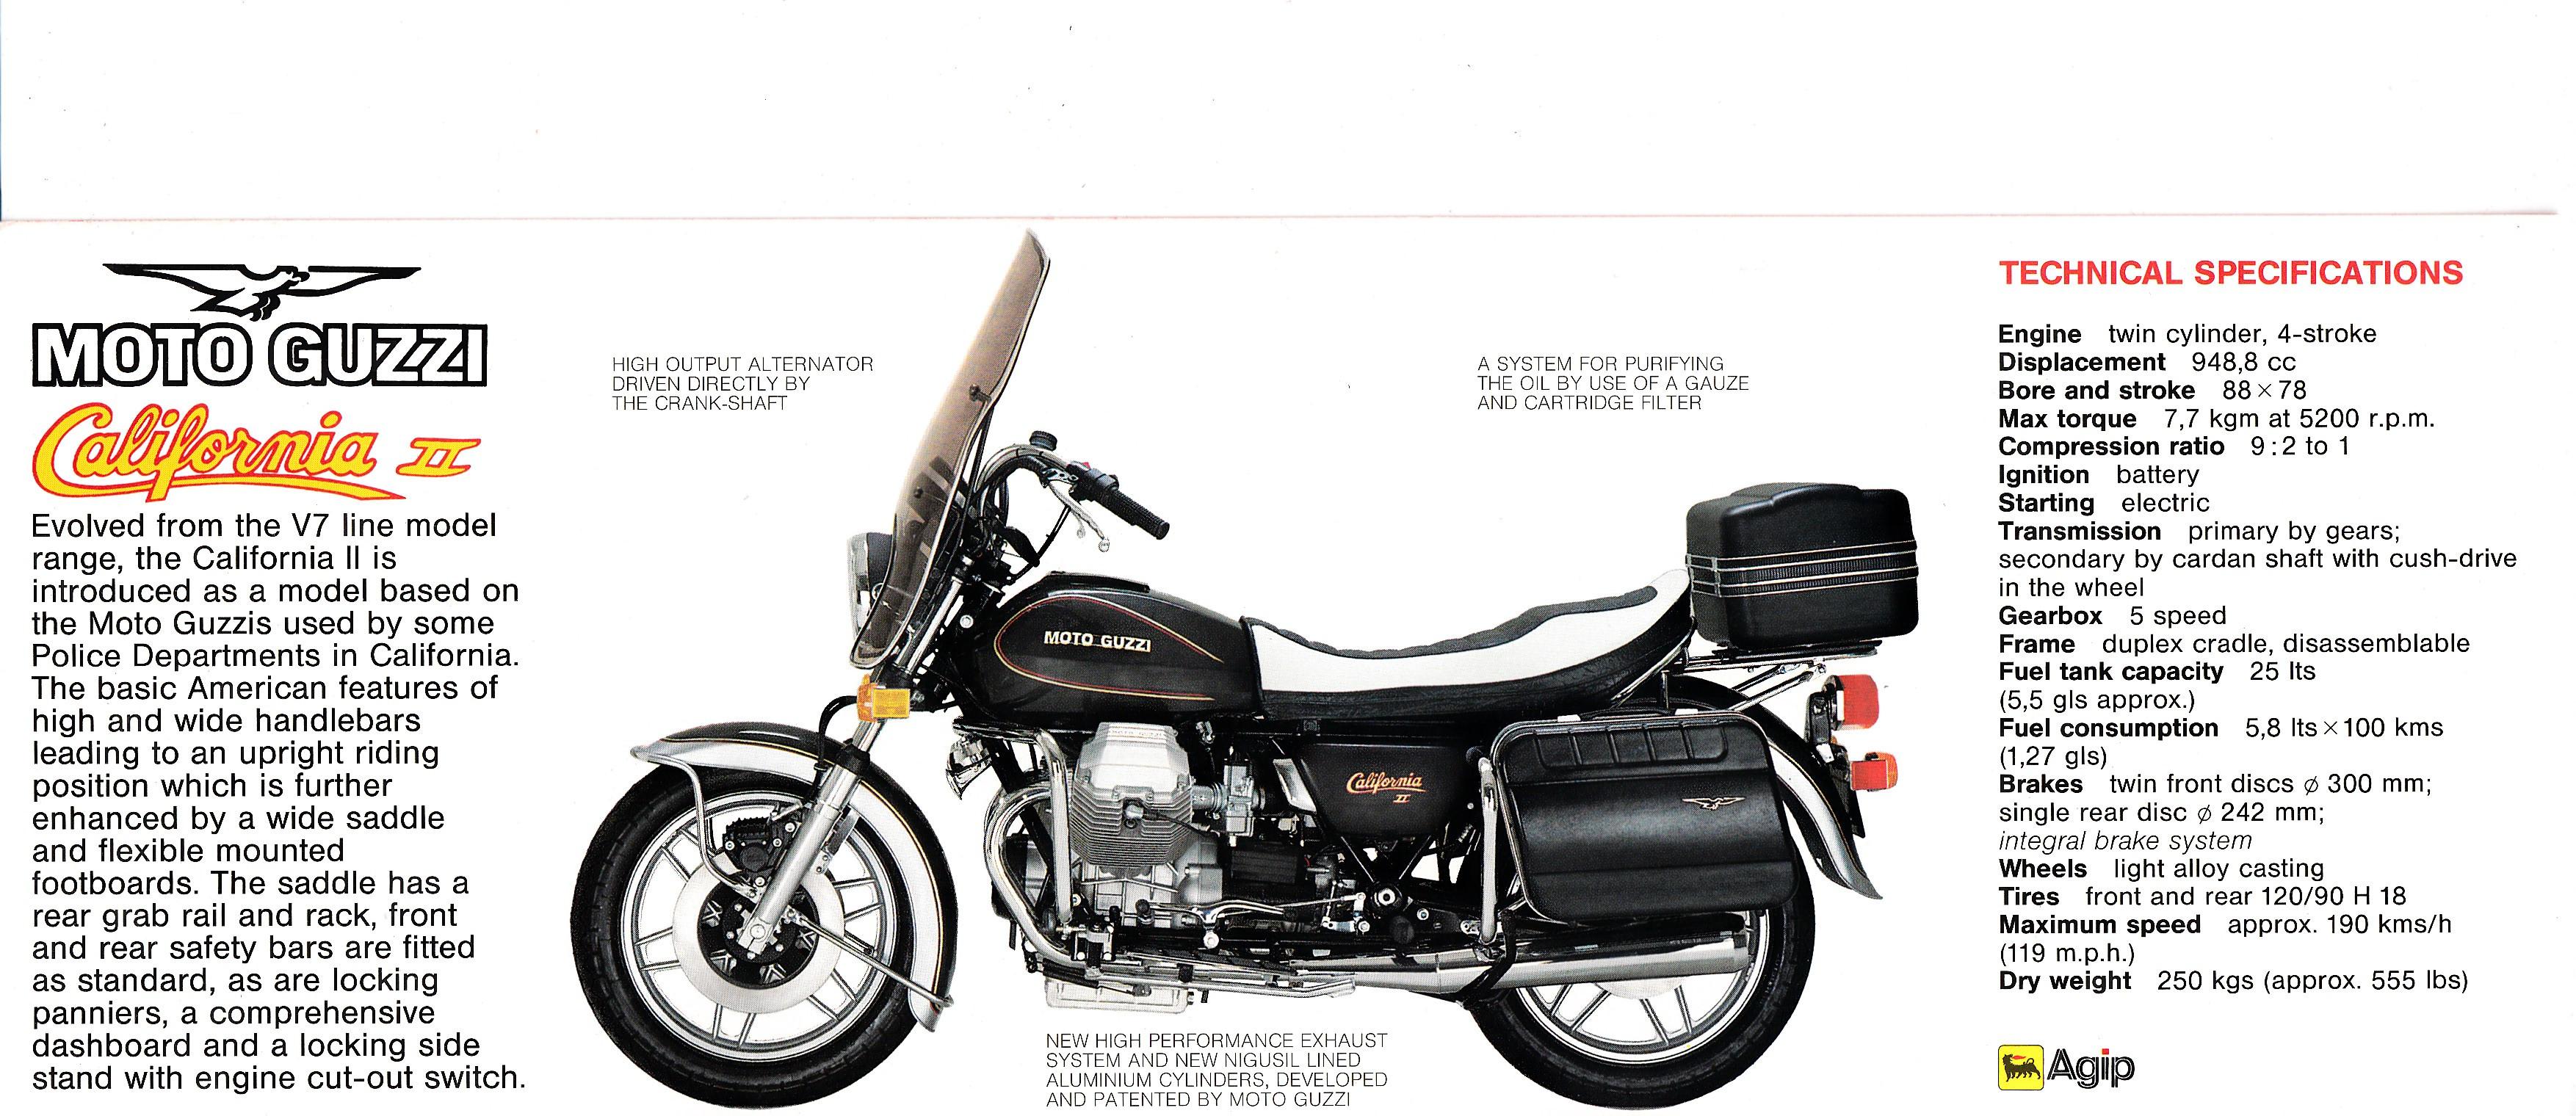 brochure moto guzzi california ii folded style brochure more moto guzzi topics moto. Black Bedroom Furniture Sets. Home Design Ideas